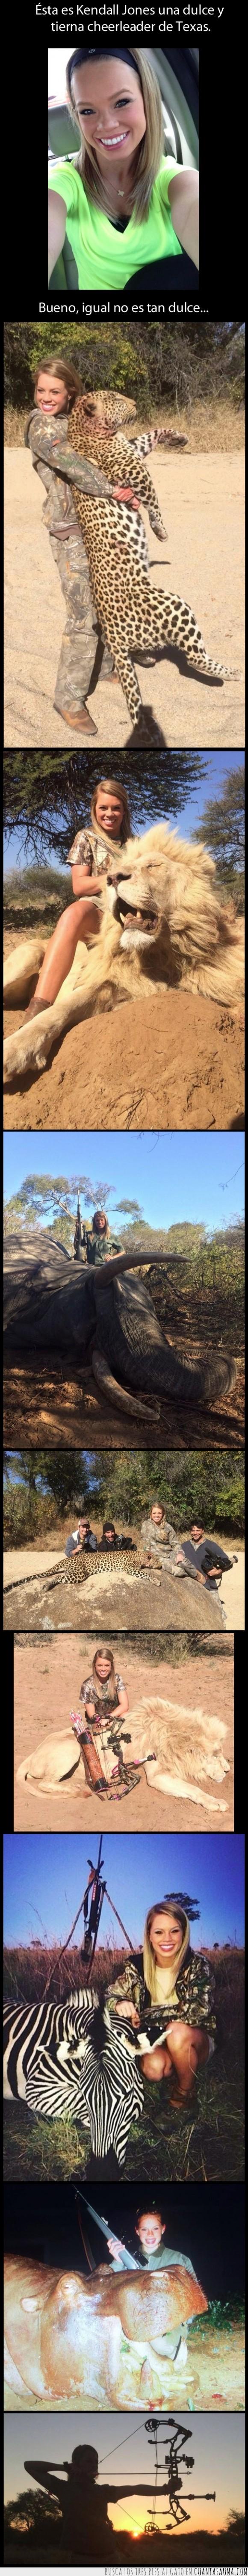 africa,animal,arco,cazadora,cazar,elefante,hipopotamo,kendall jones,leon,leopardo,muerte,muerto,sabana,safari